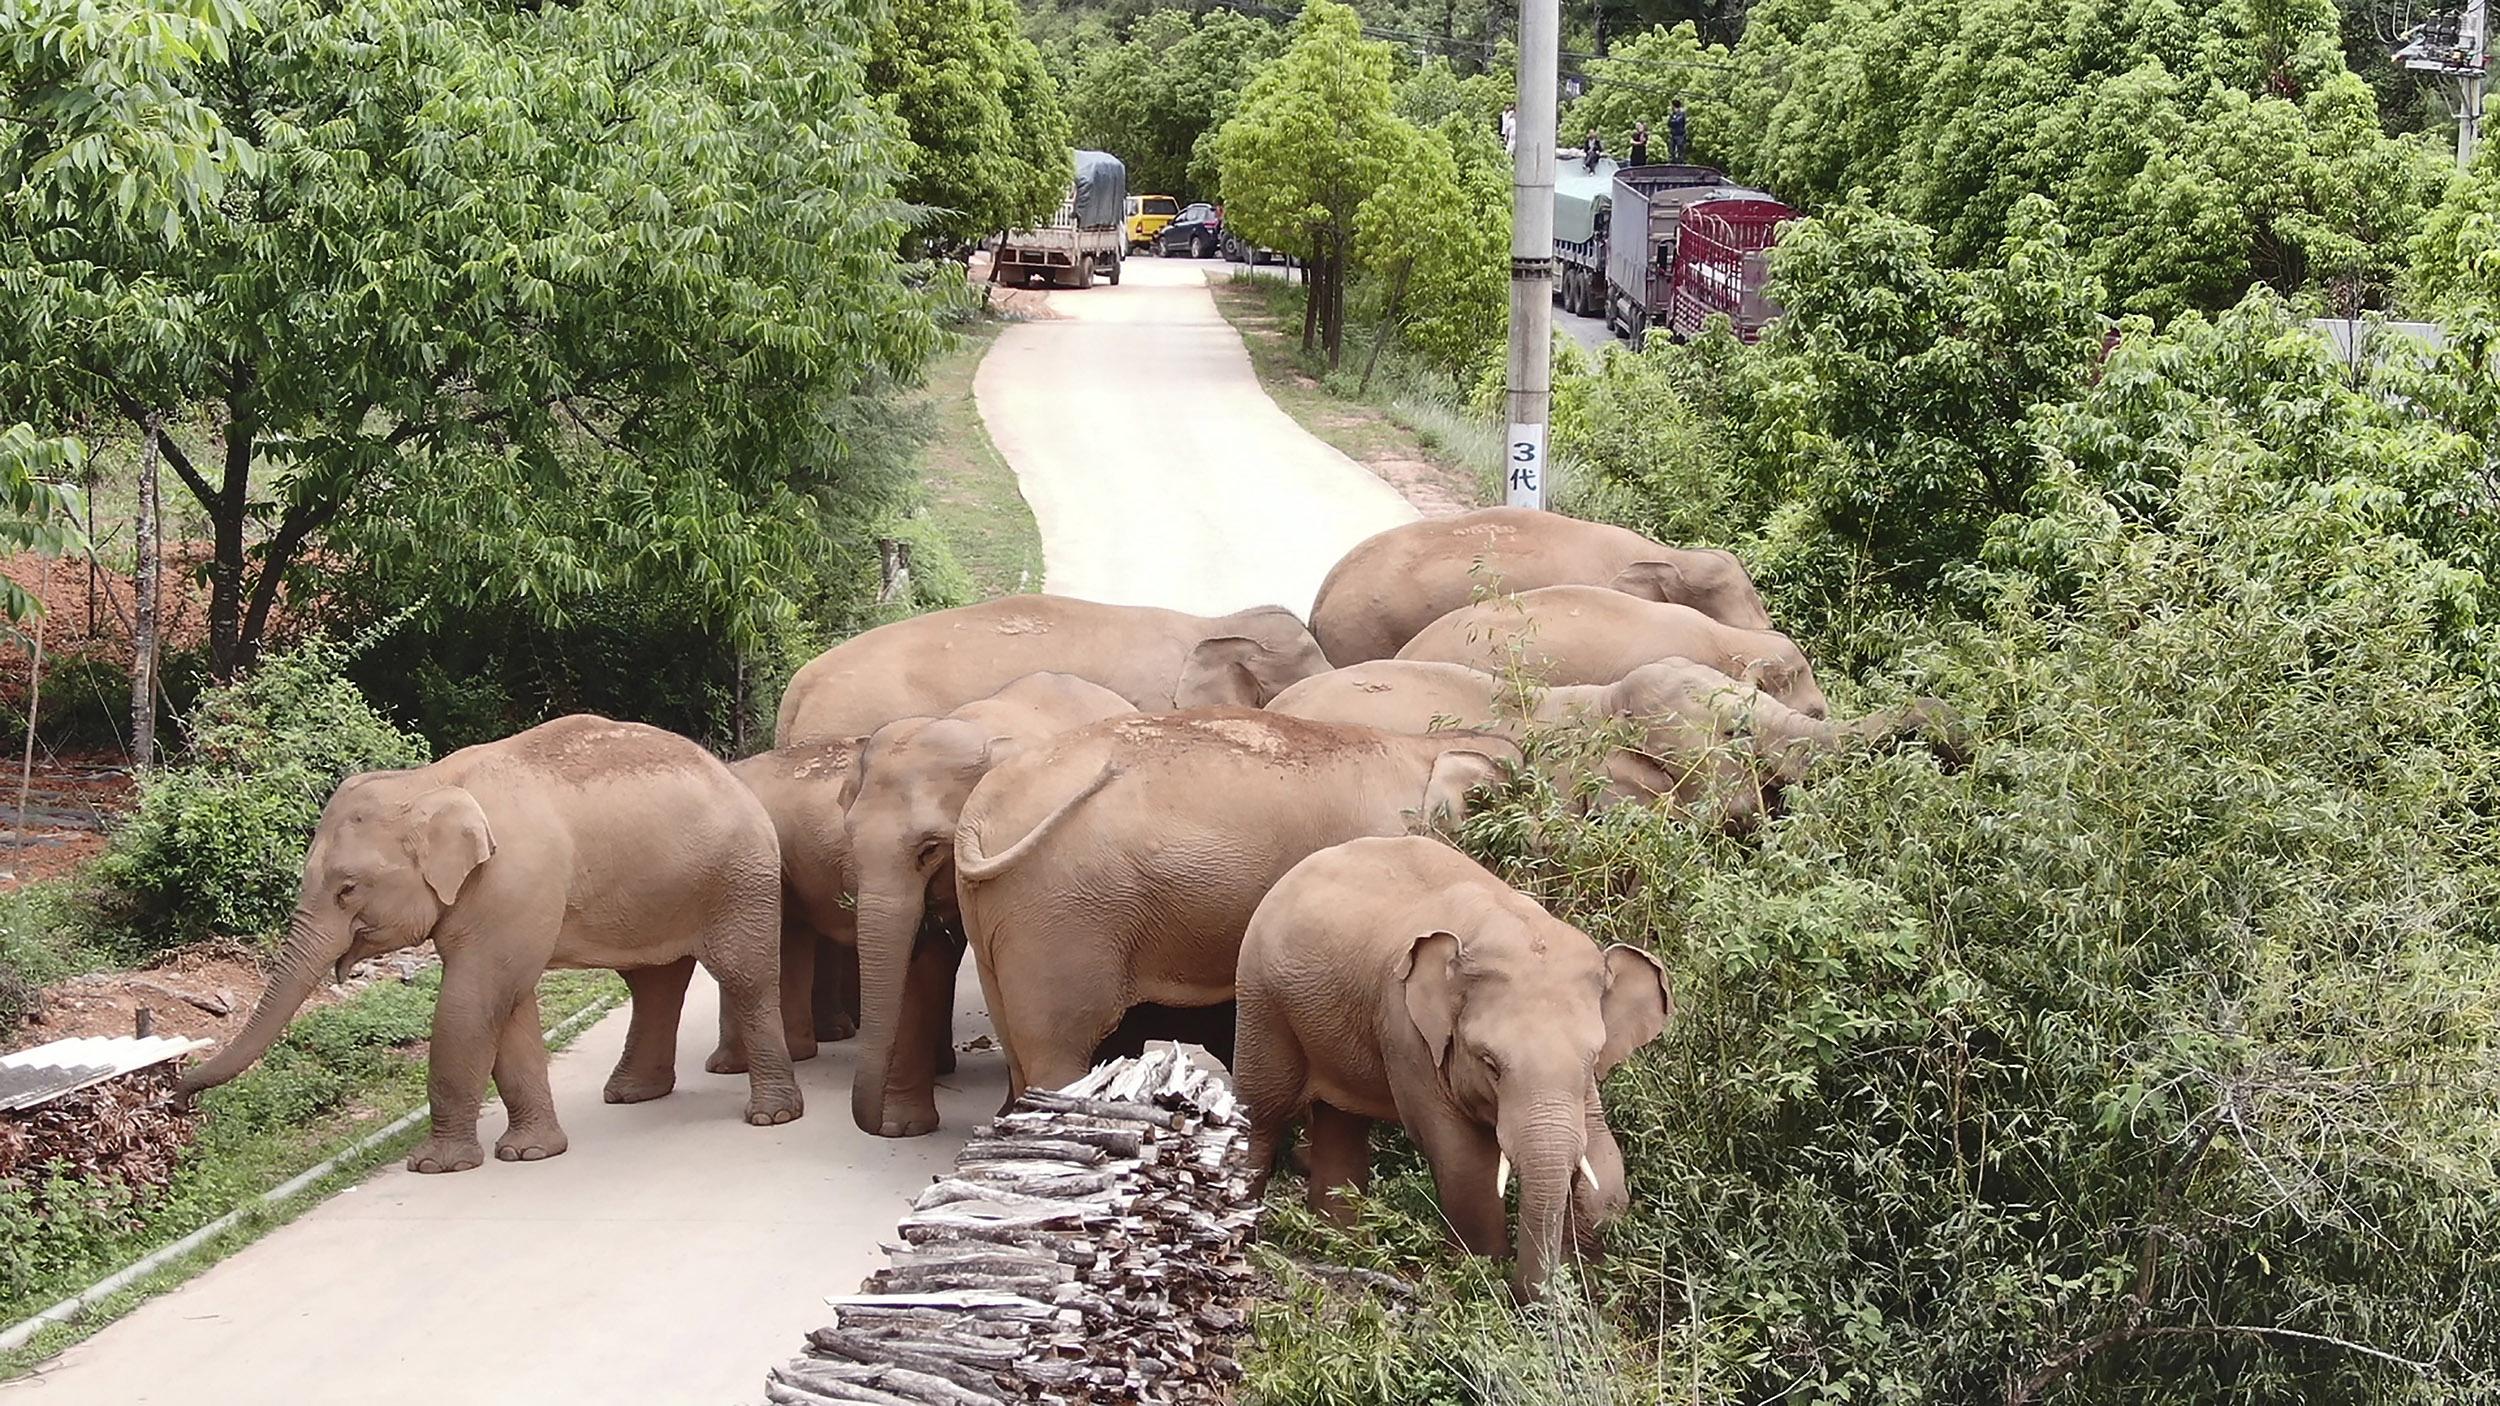 210609-china_wandering_elephants-mc-1435